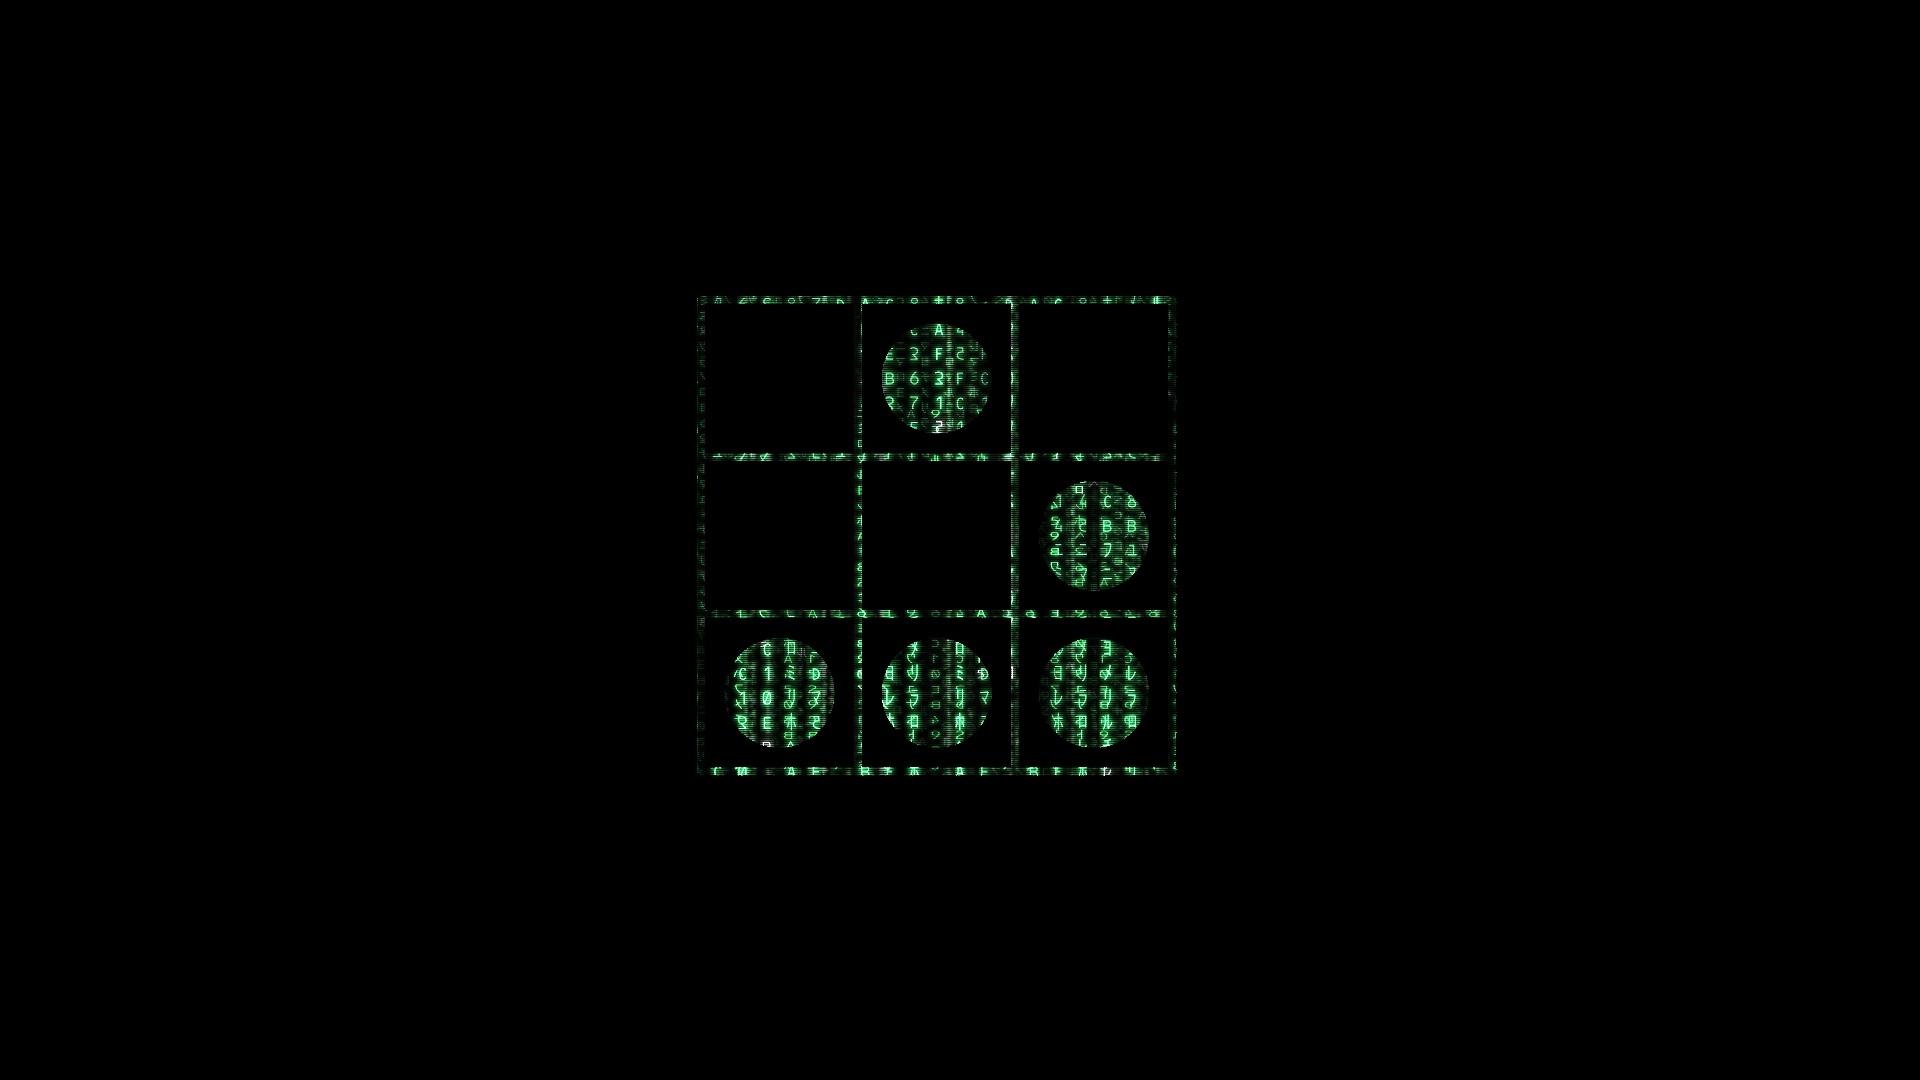 Hacking Matrix Wallpaper 1920x1080 Hacking Matrix Code Hackers 1920x1080